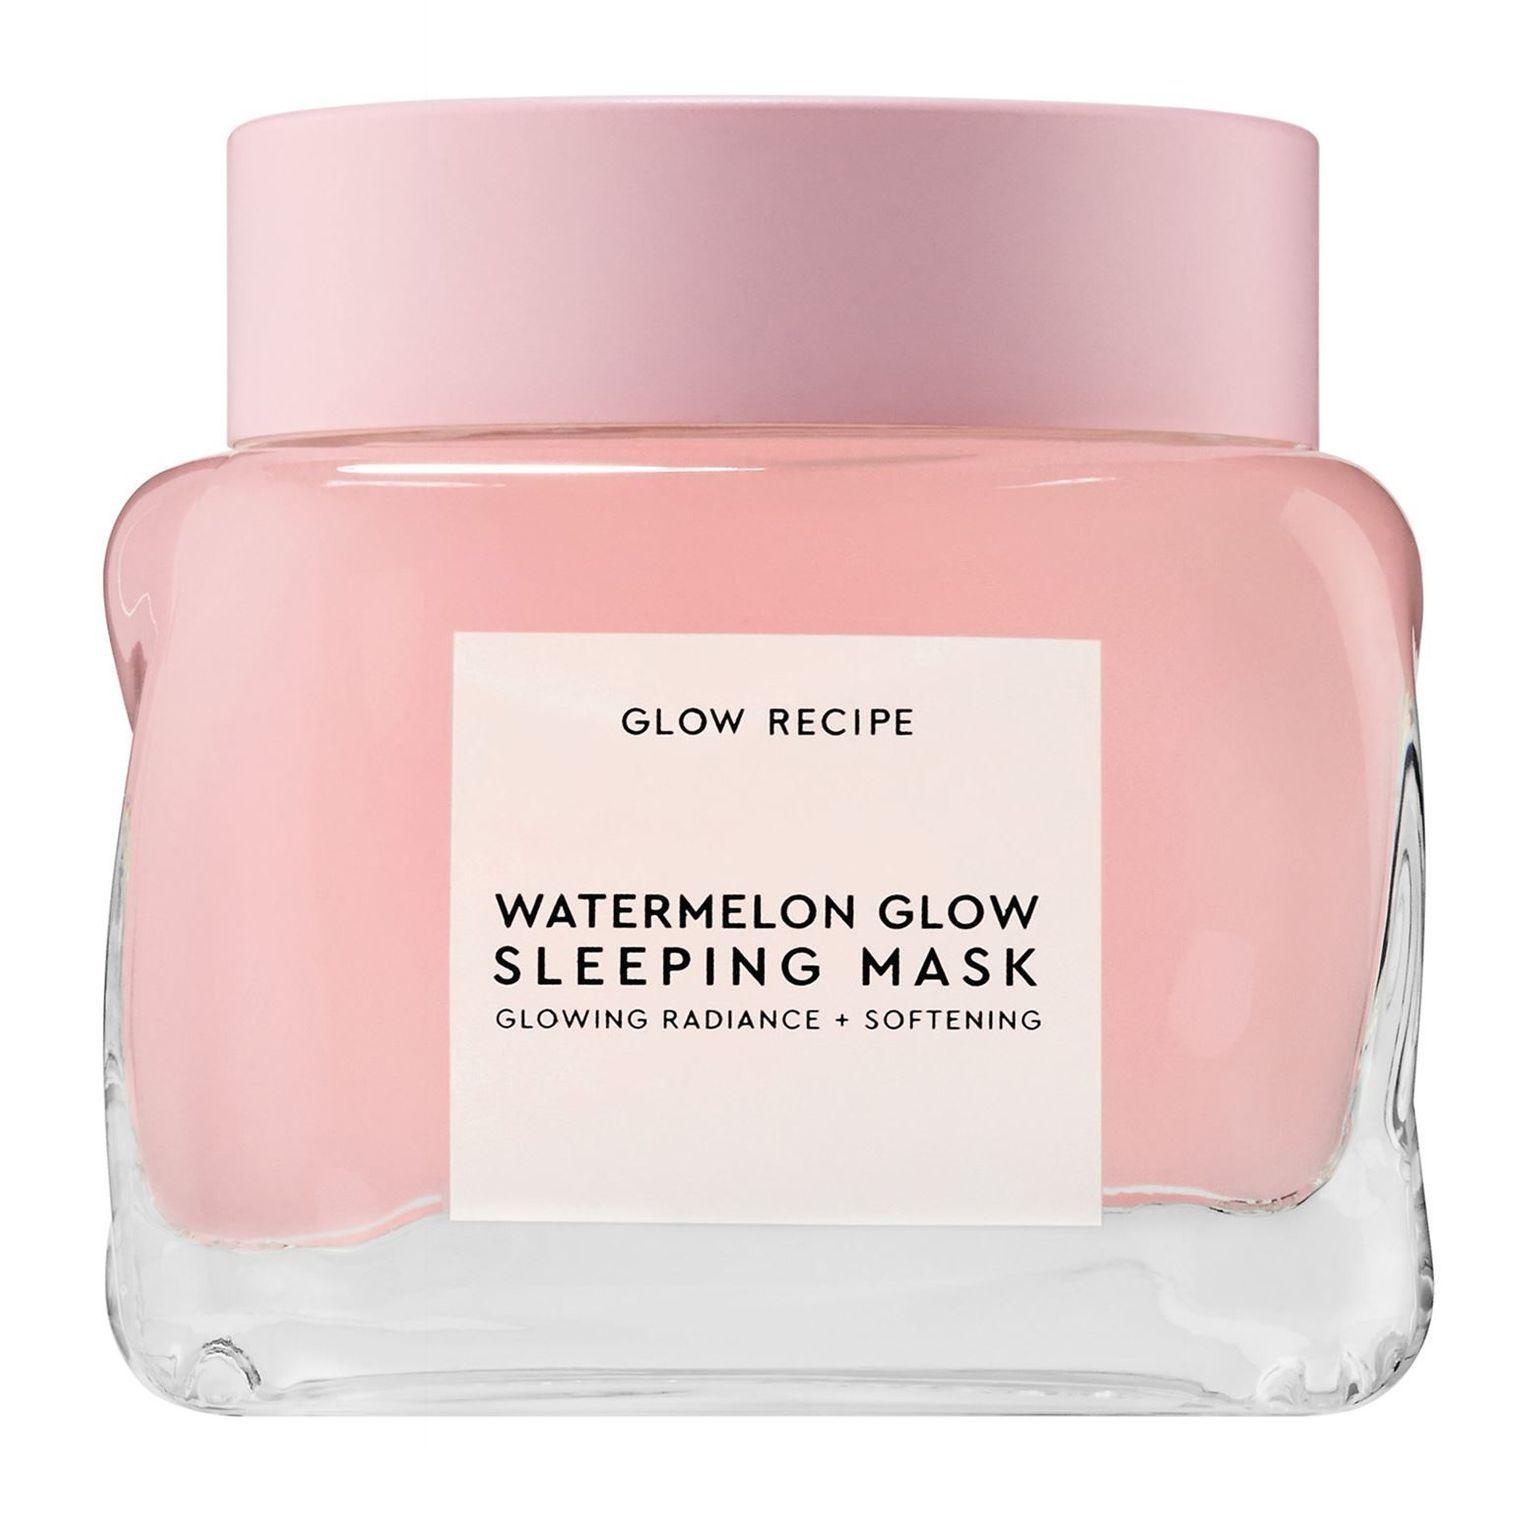 Watermelon Glow Sleeping Mask